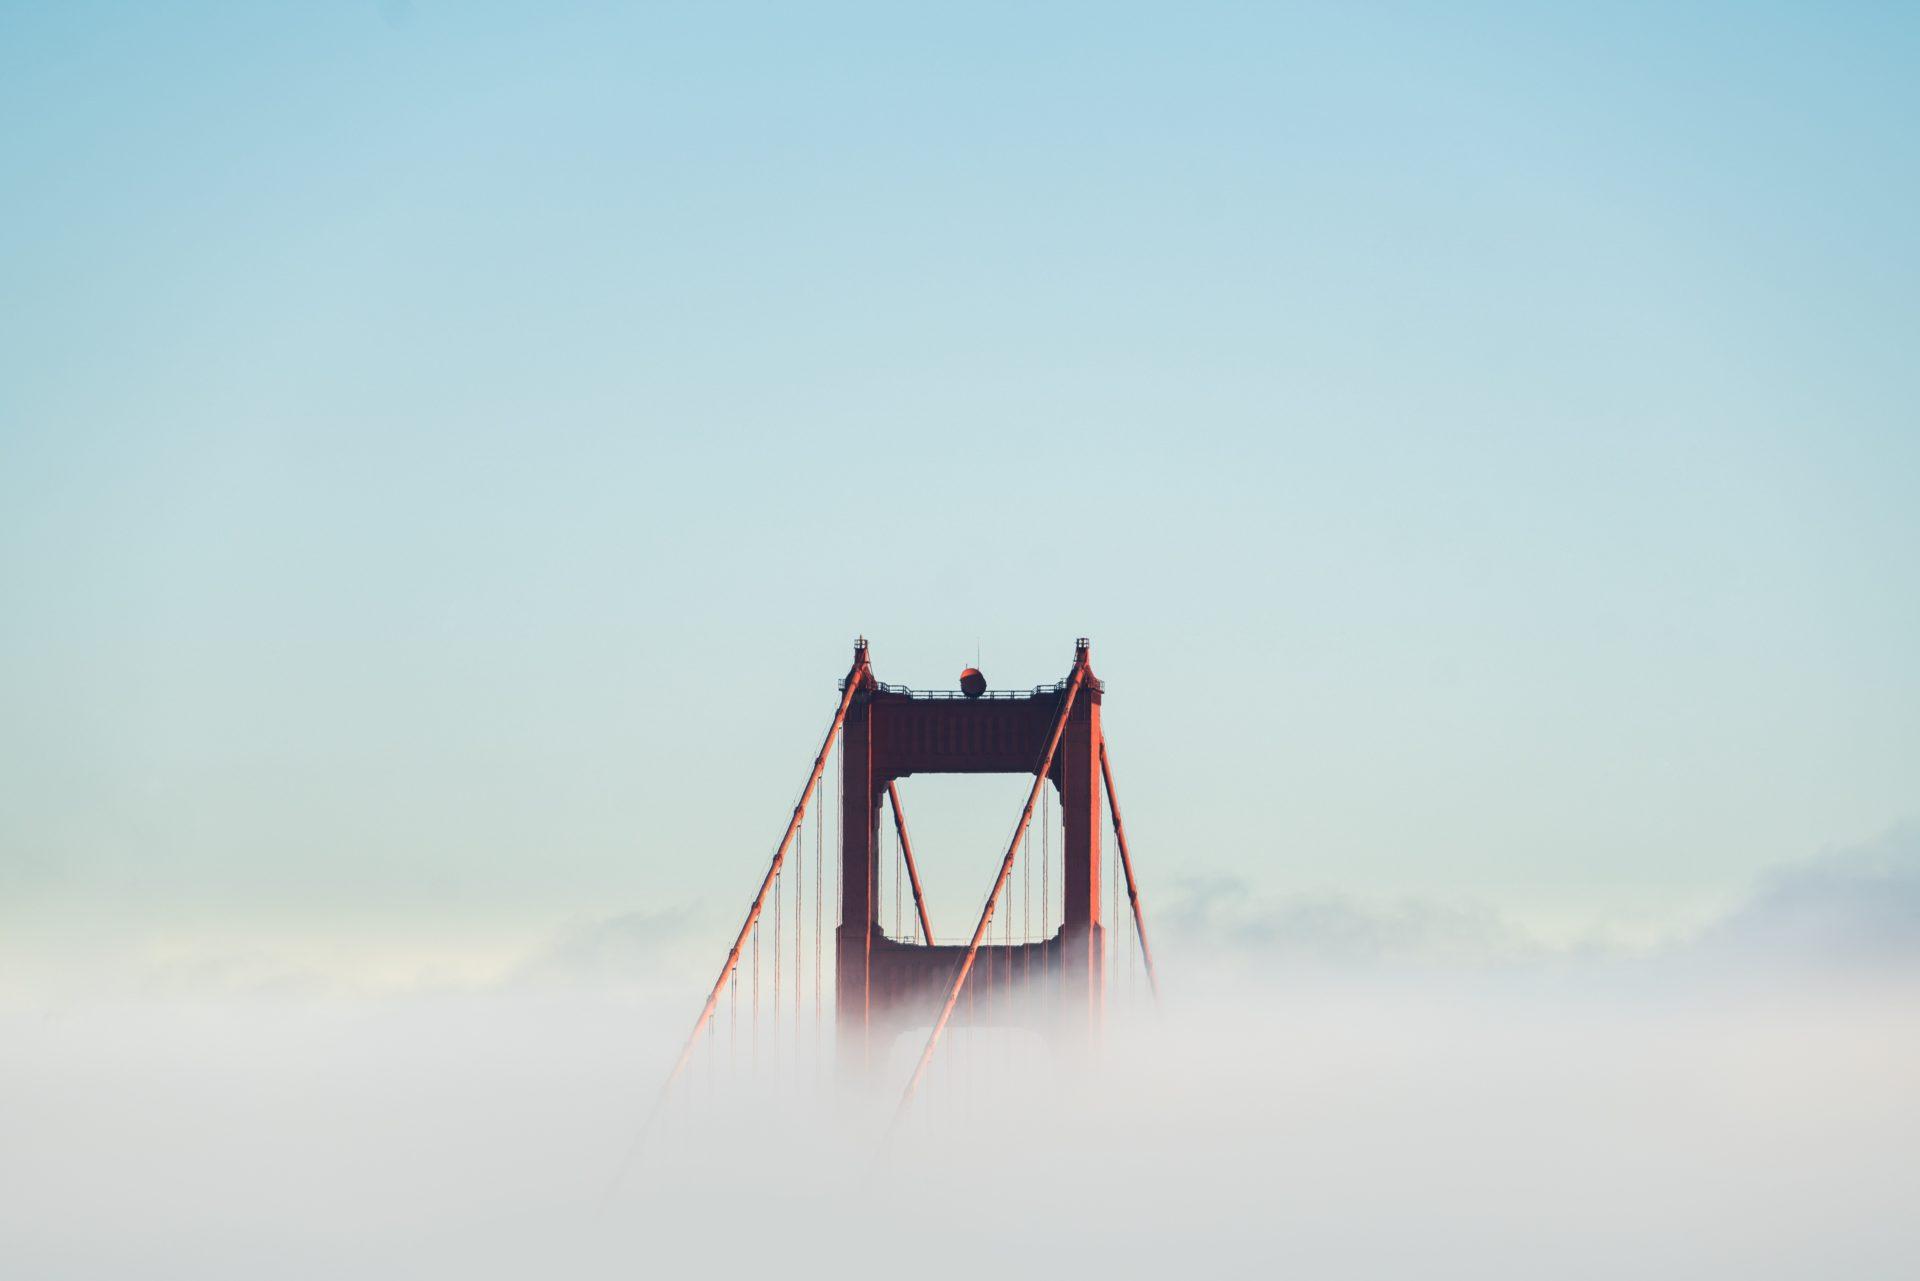 Golden Gate Bridge Enshrouded in Fog